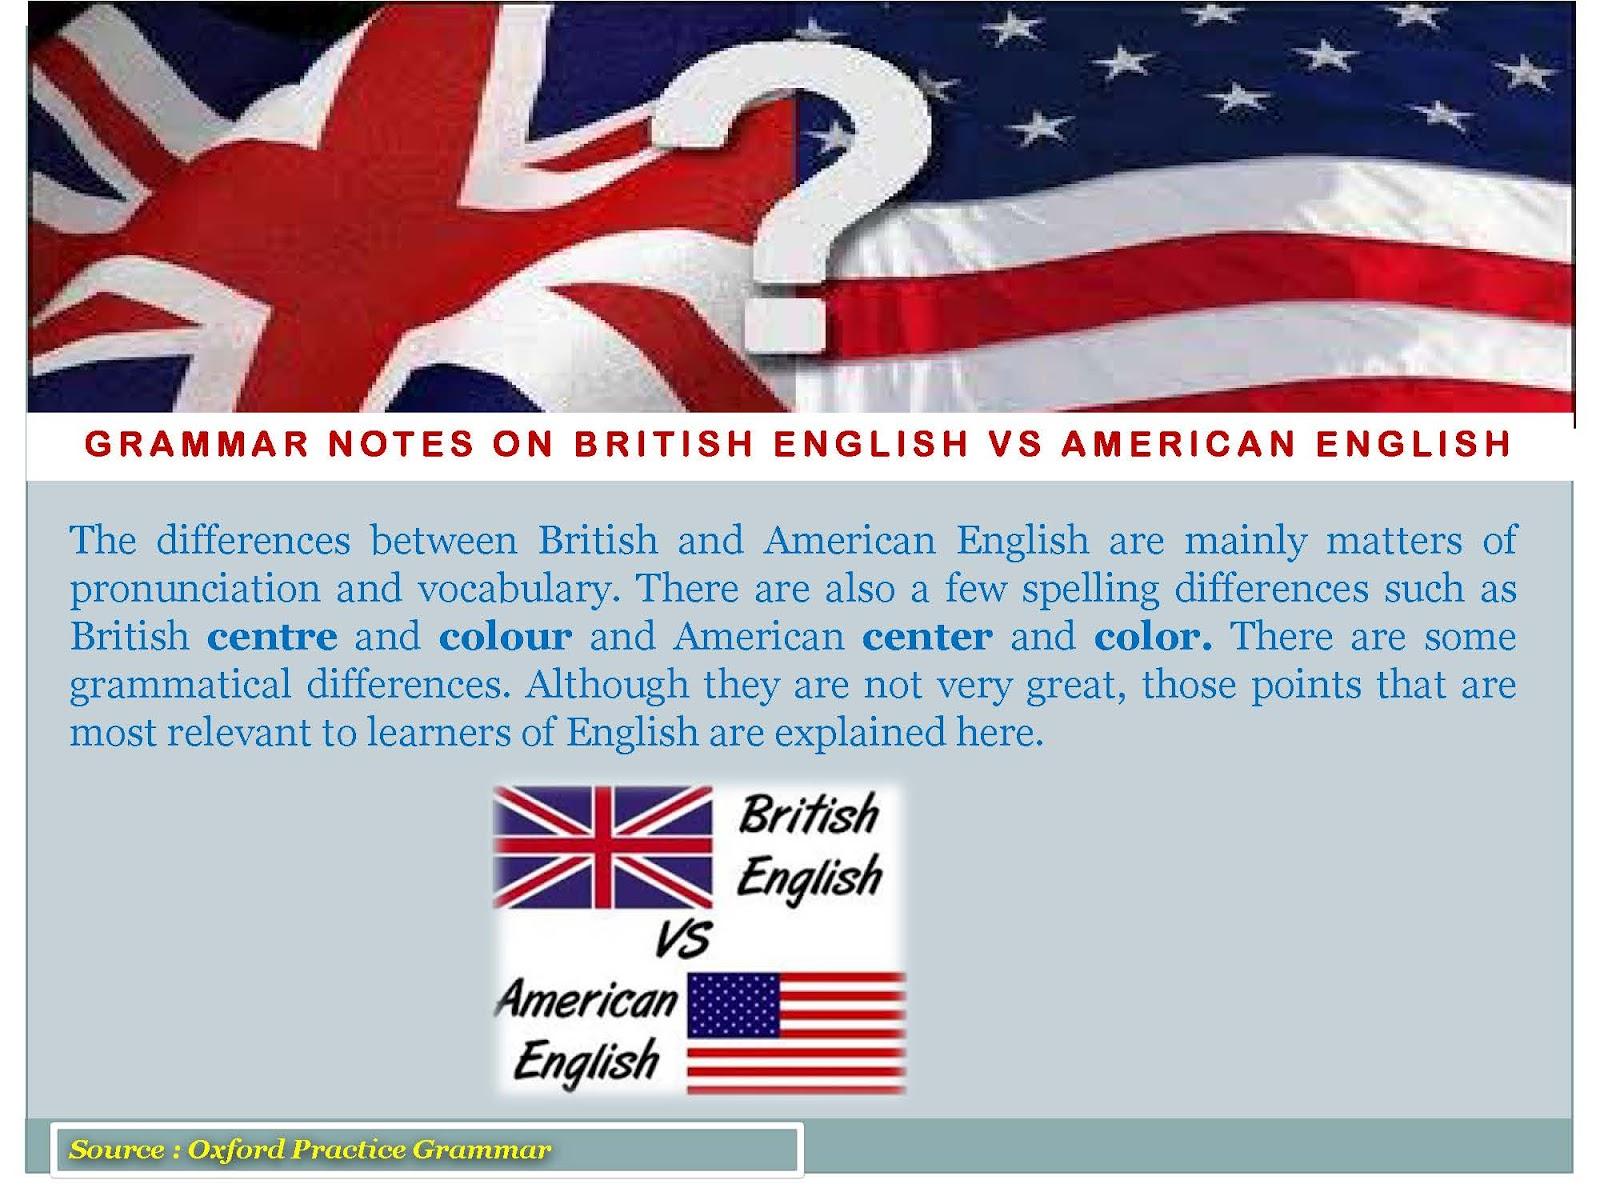 Thầy Sa: Grammar Notes on British English vs American English